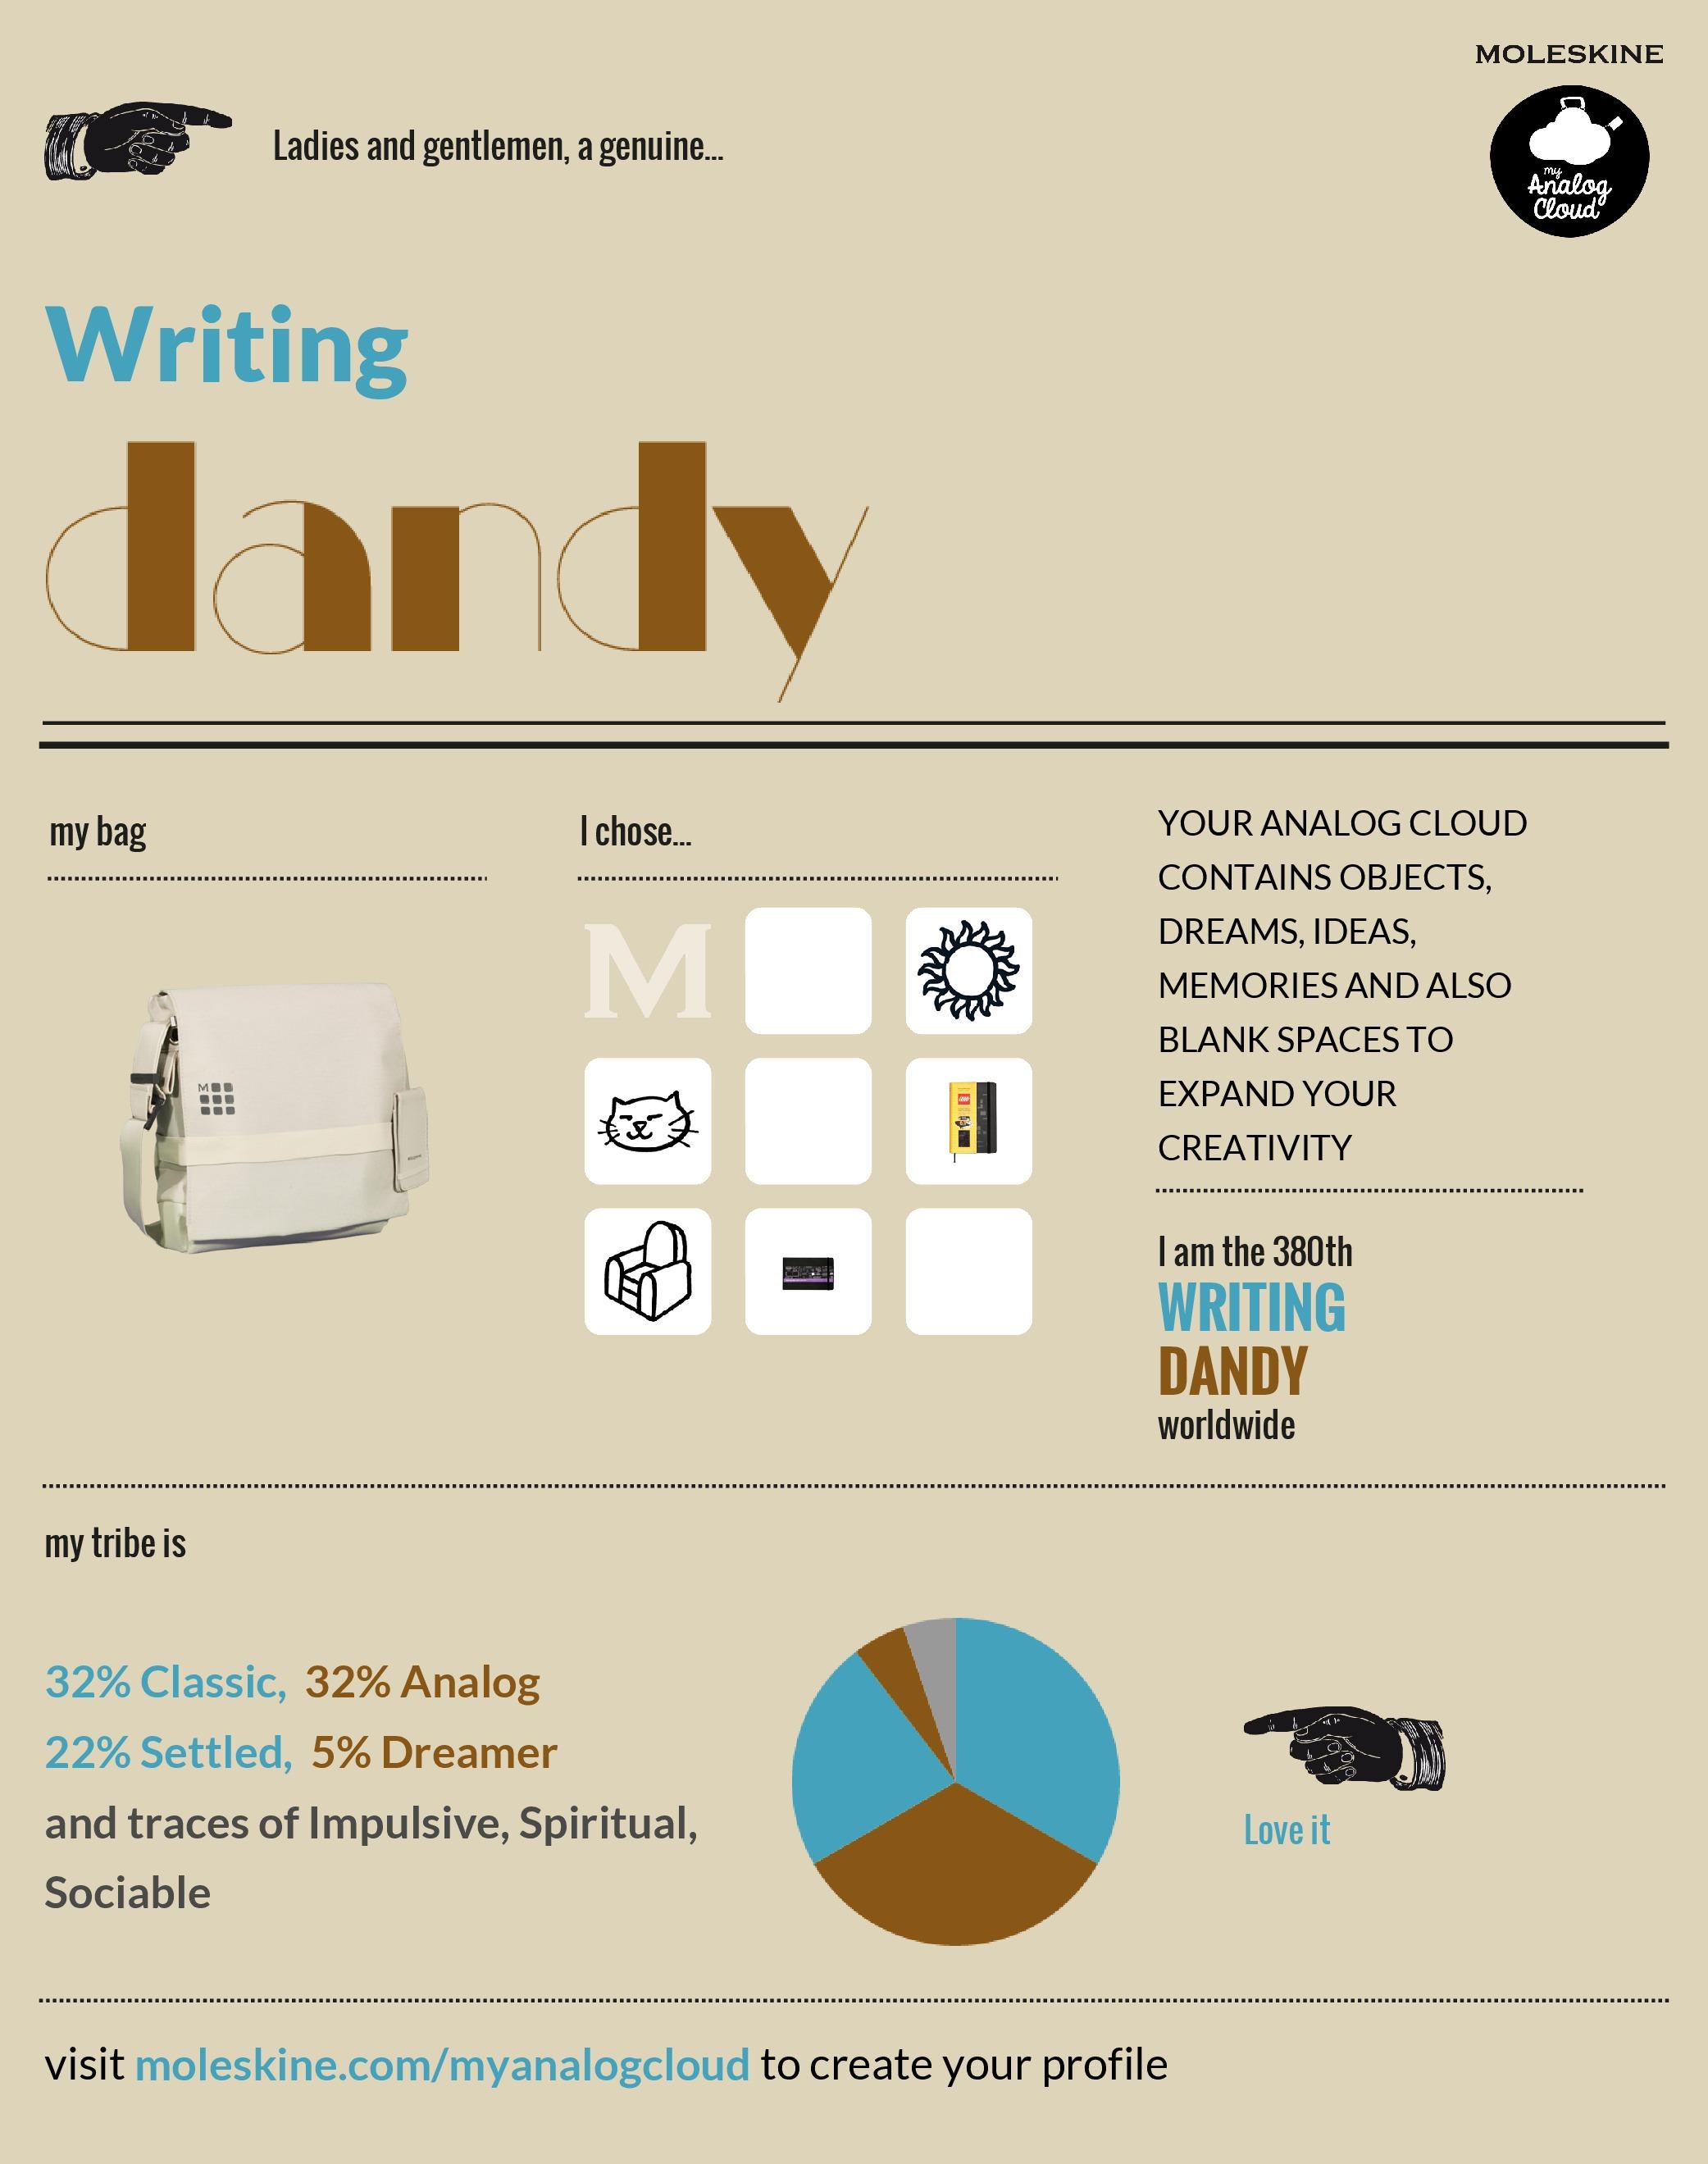 Writing Dandy